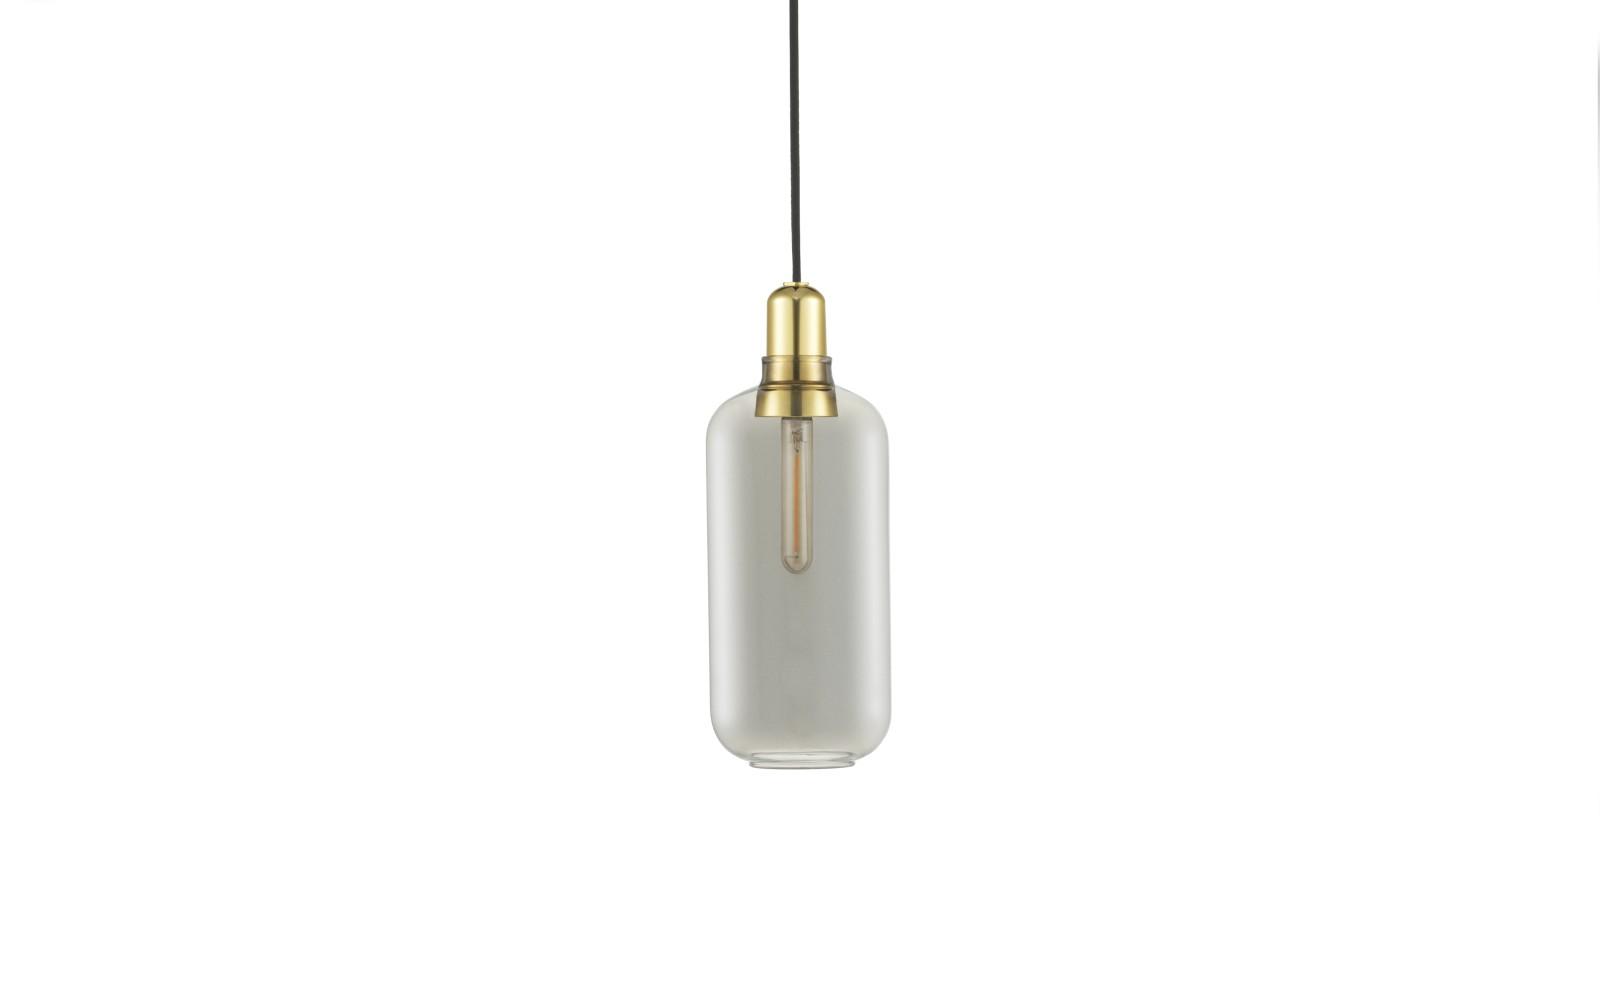 Amp Pendant Light Smoke/Brass, Large